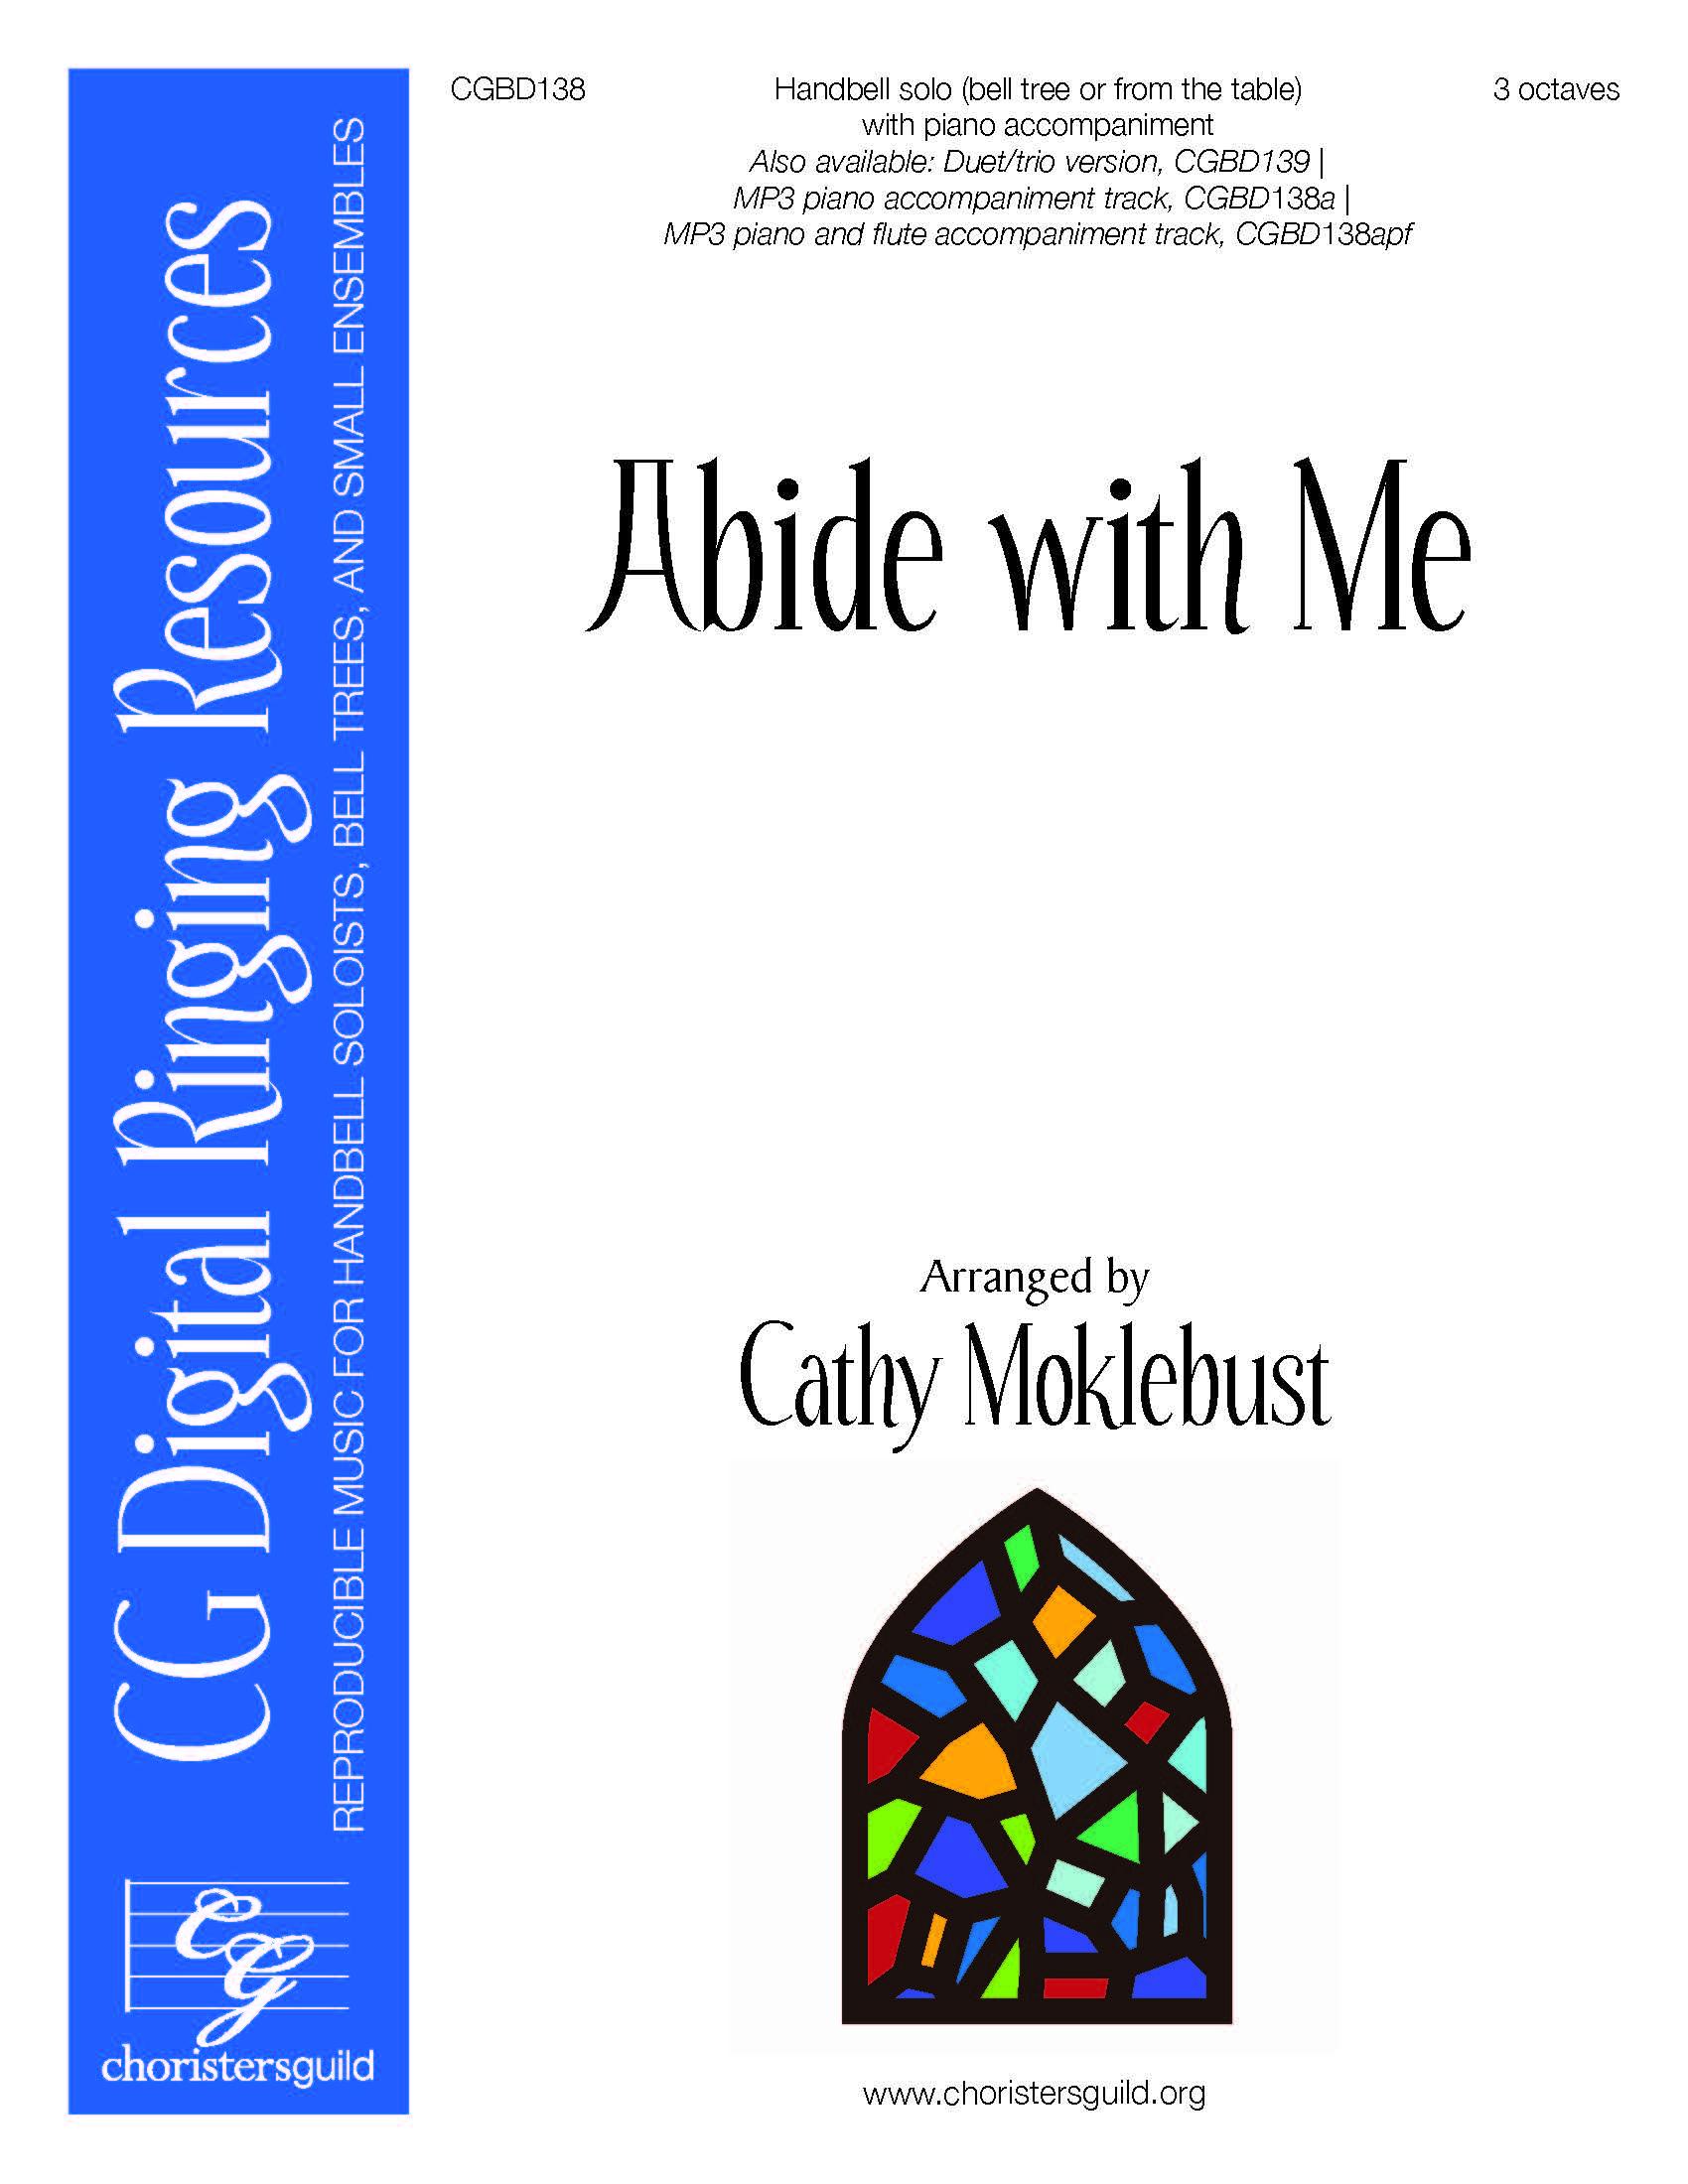 Abide with Me - Digital Piano Accompaniment Track